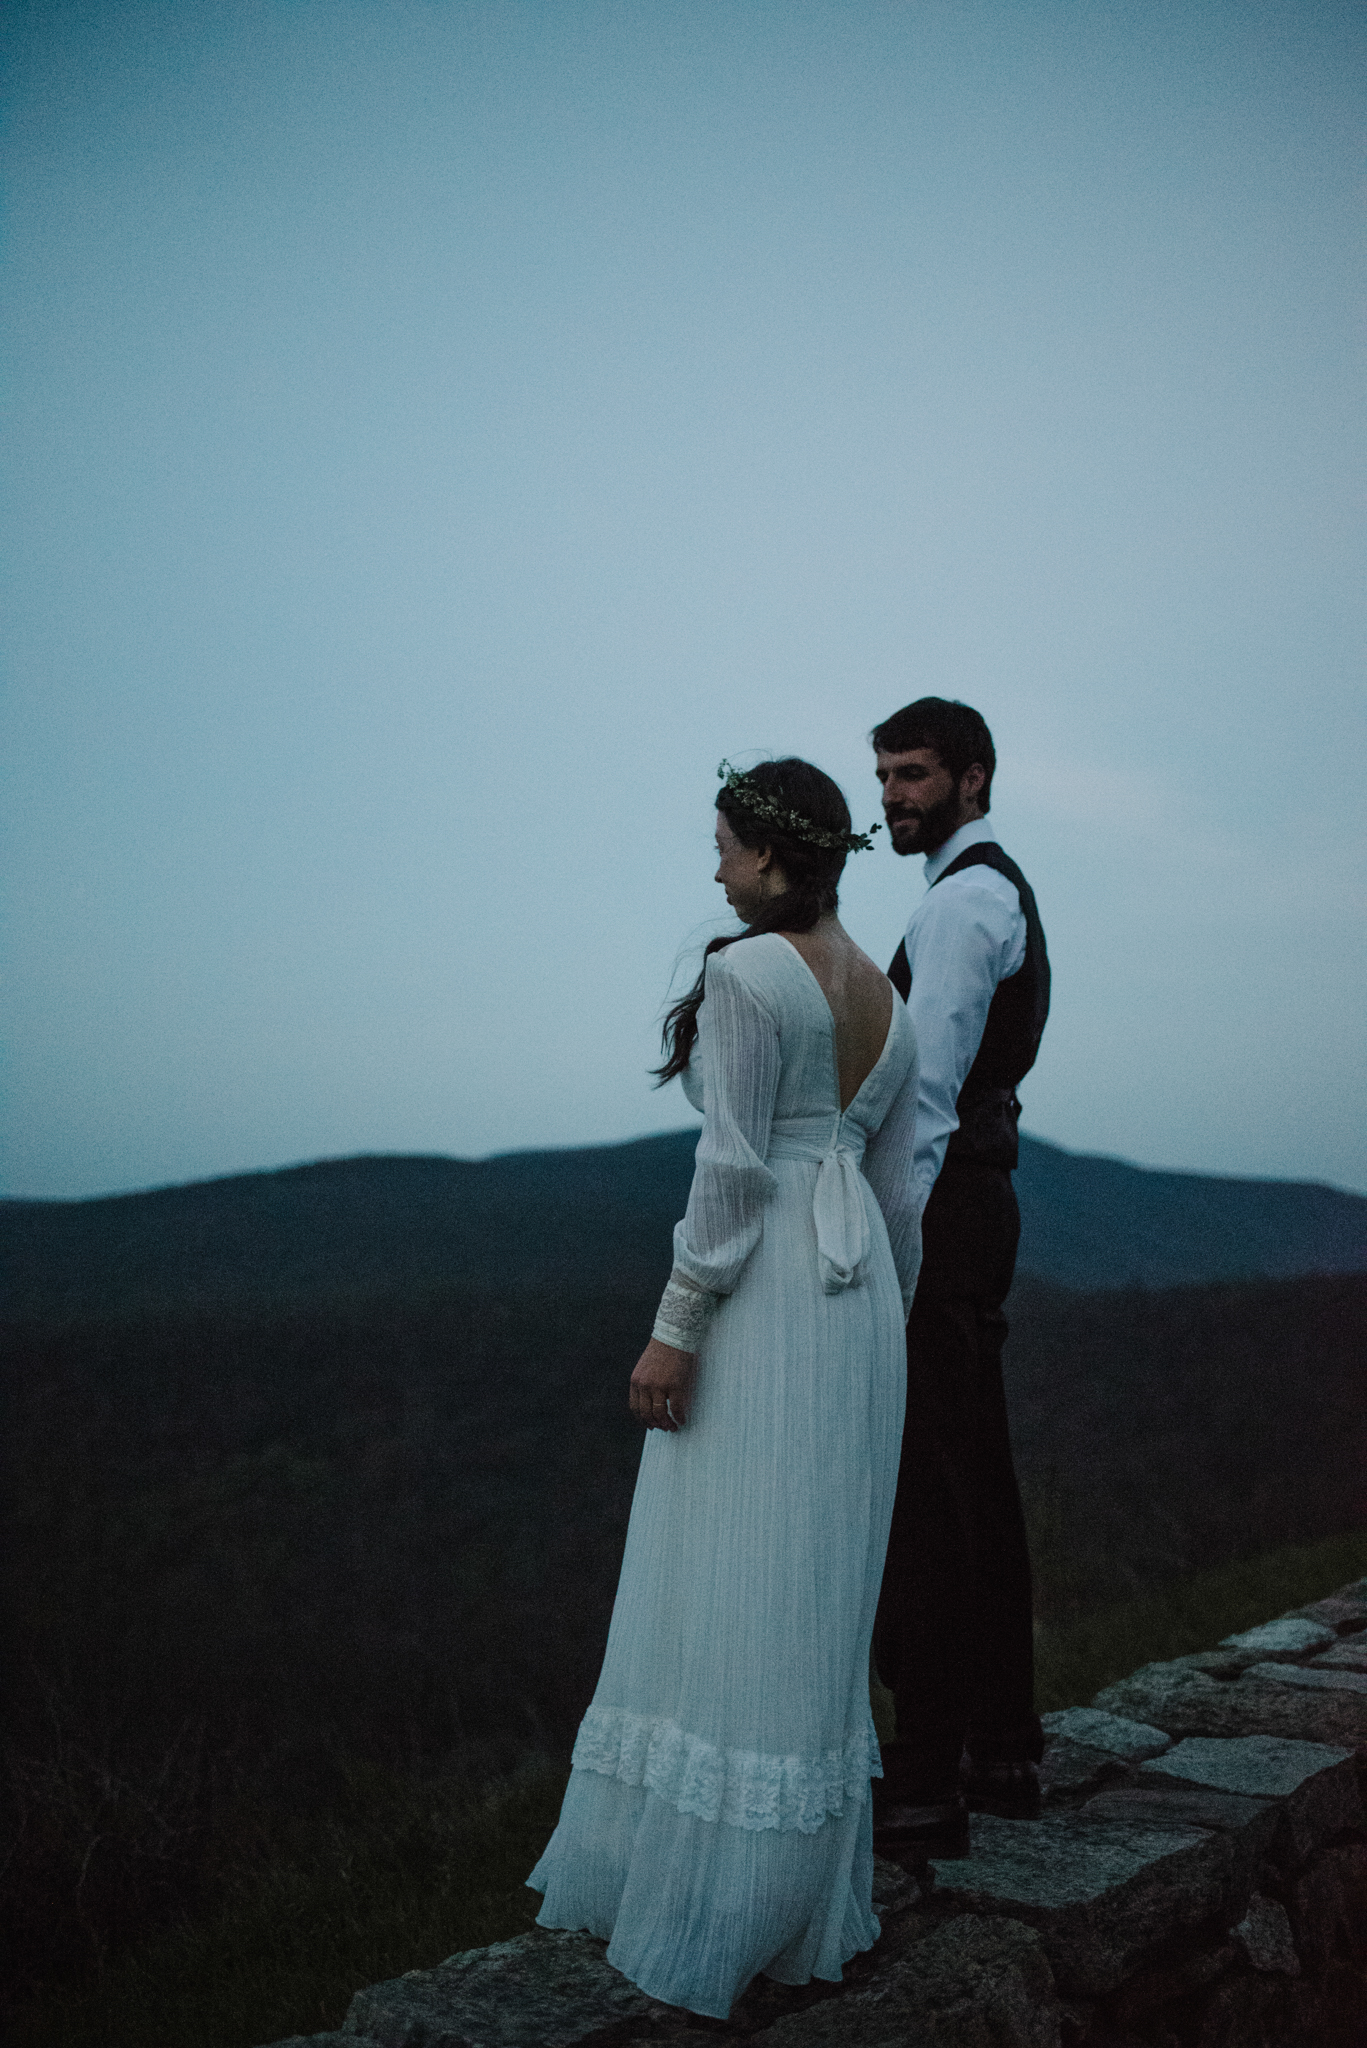 Lisa and Stuart - Post Wedding Couple Portraits - White Sails Creative - Blue Ridge Mountains - Sunrise Shenandoah National Park_9.JPG